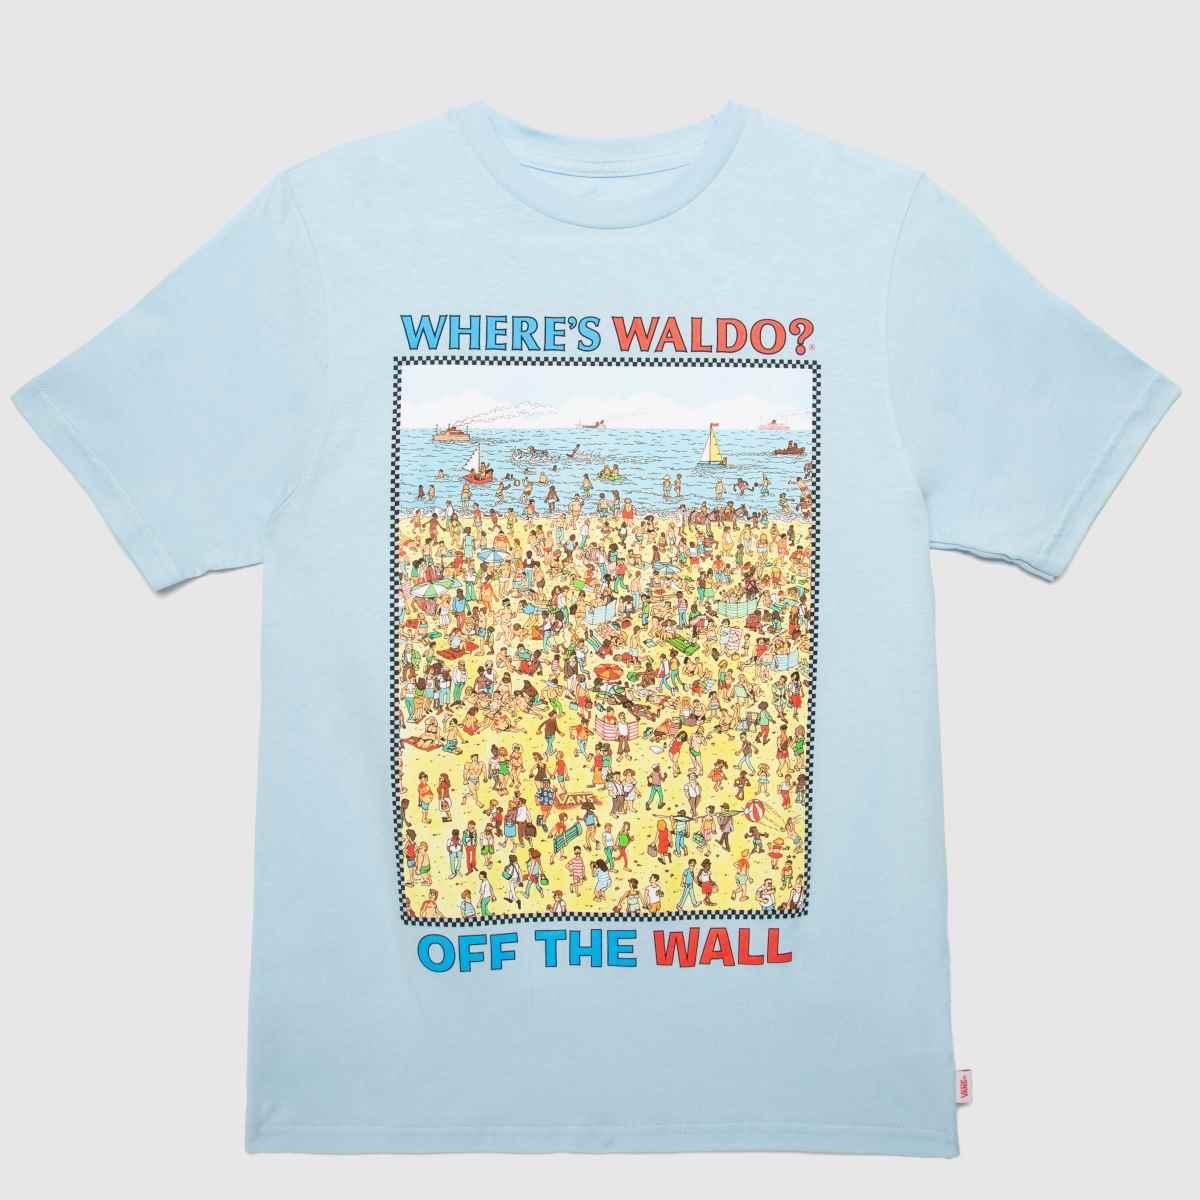 Vans Blue & Yellow Wheres Waldo T-shirt